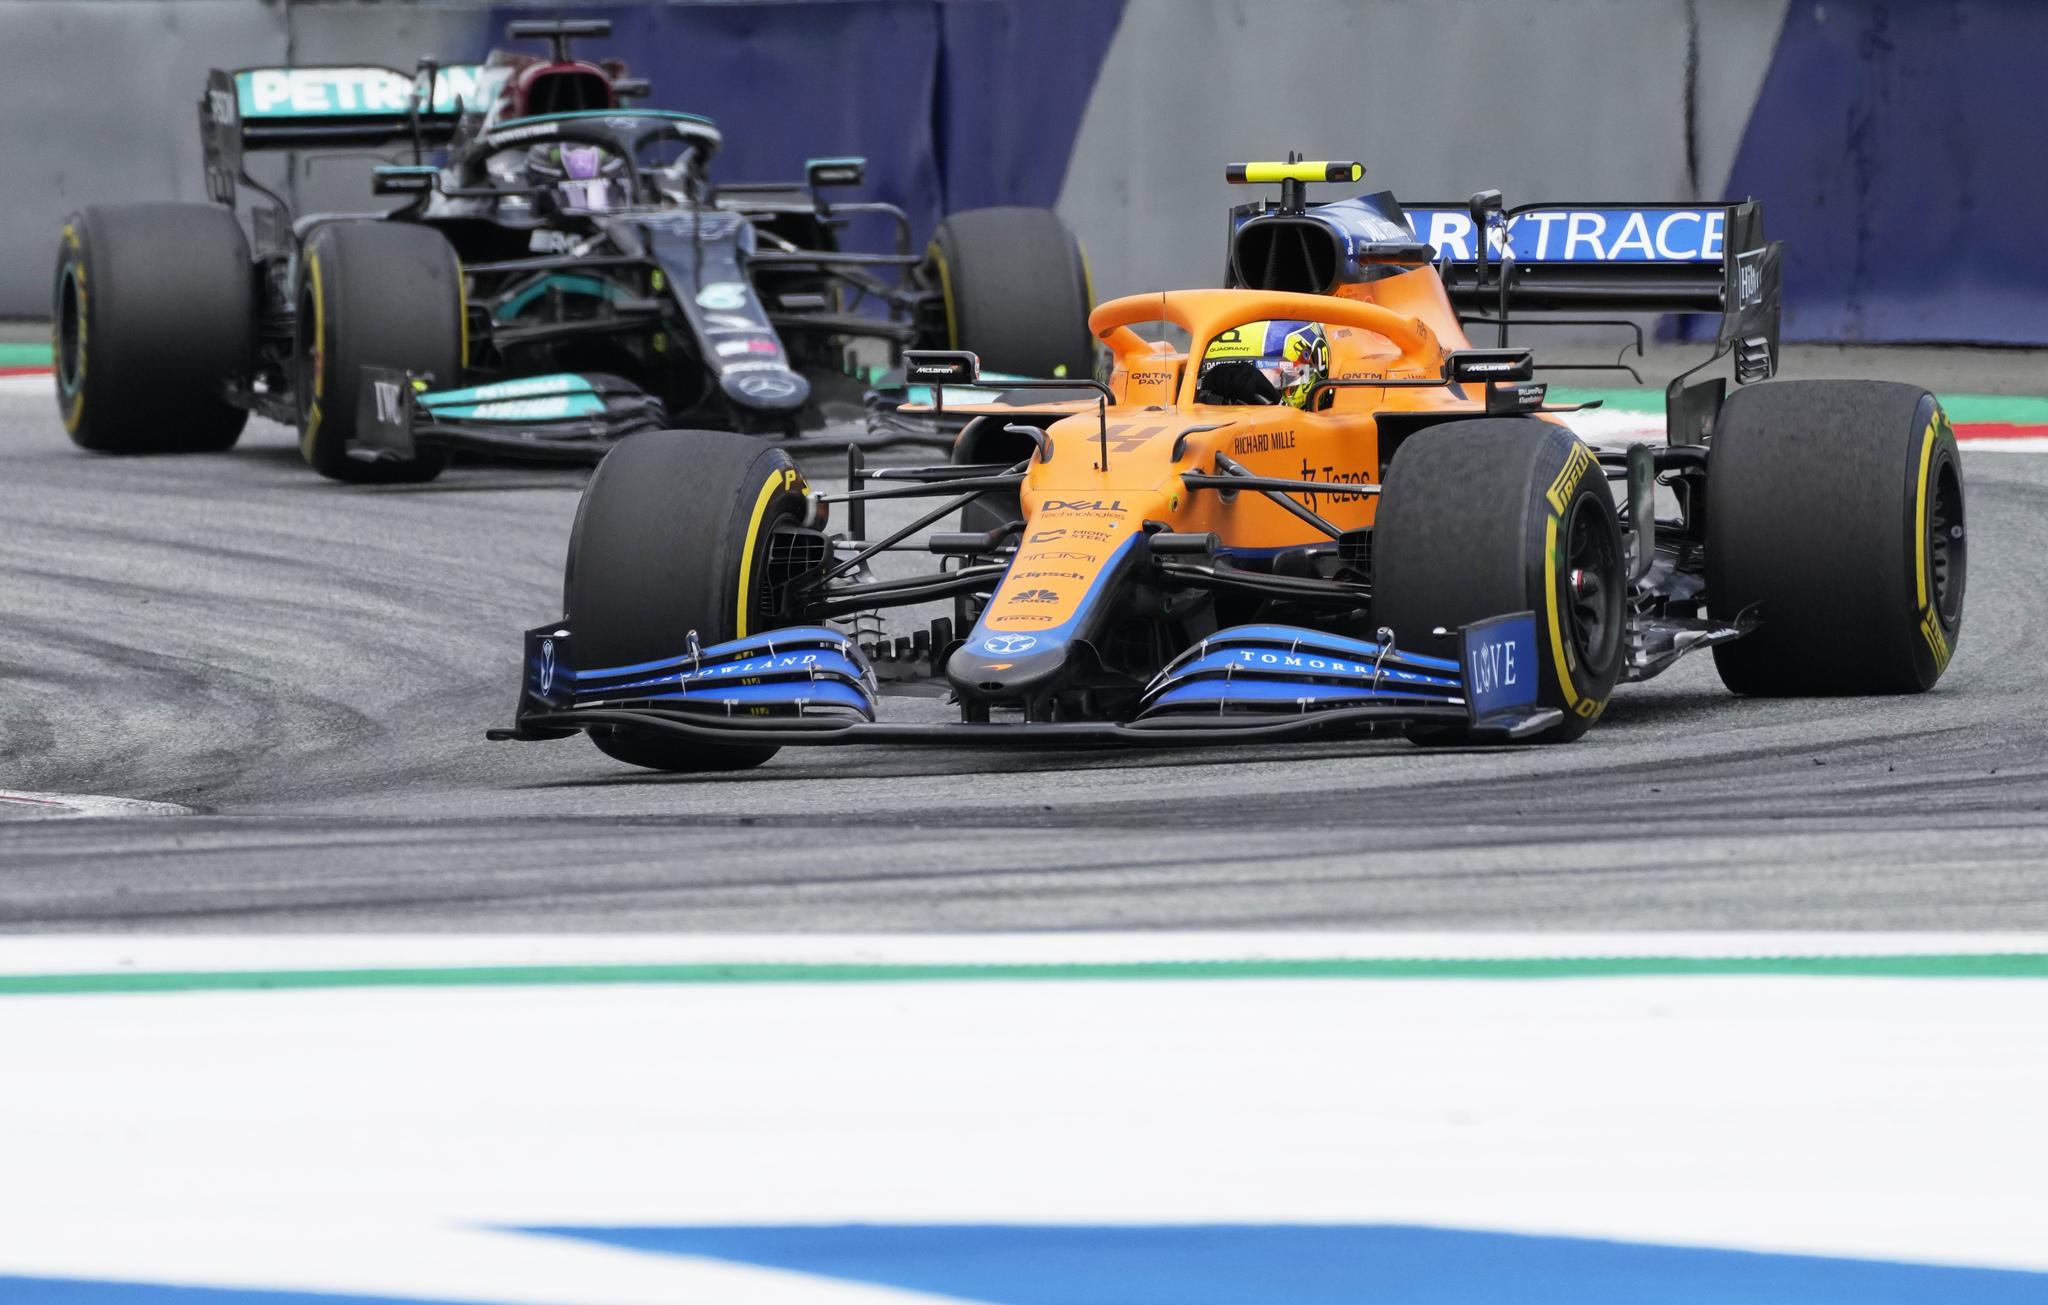 Mclaren driver Lando Norris followed by Mercedes driver Lewis Hamilton